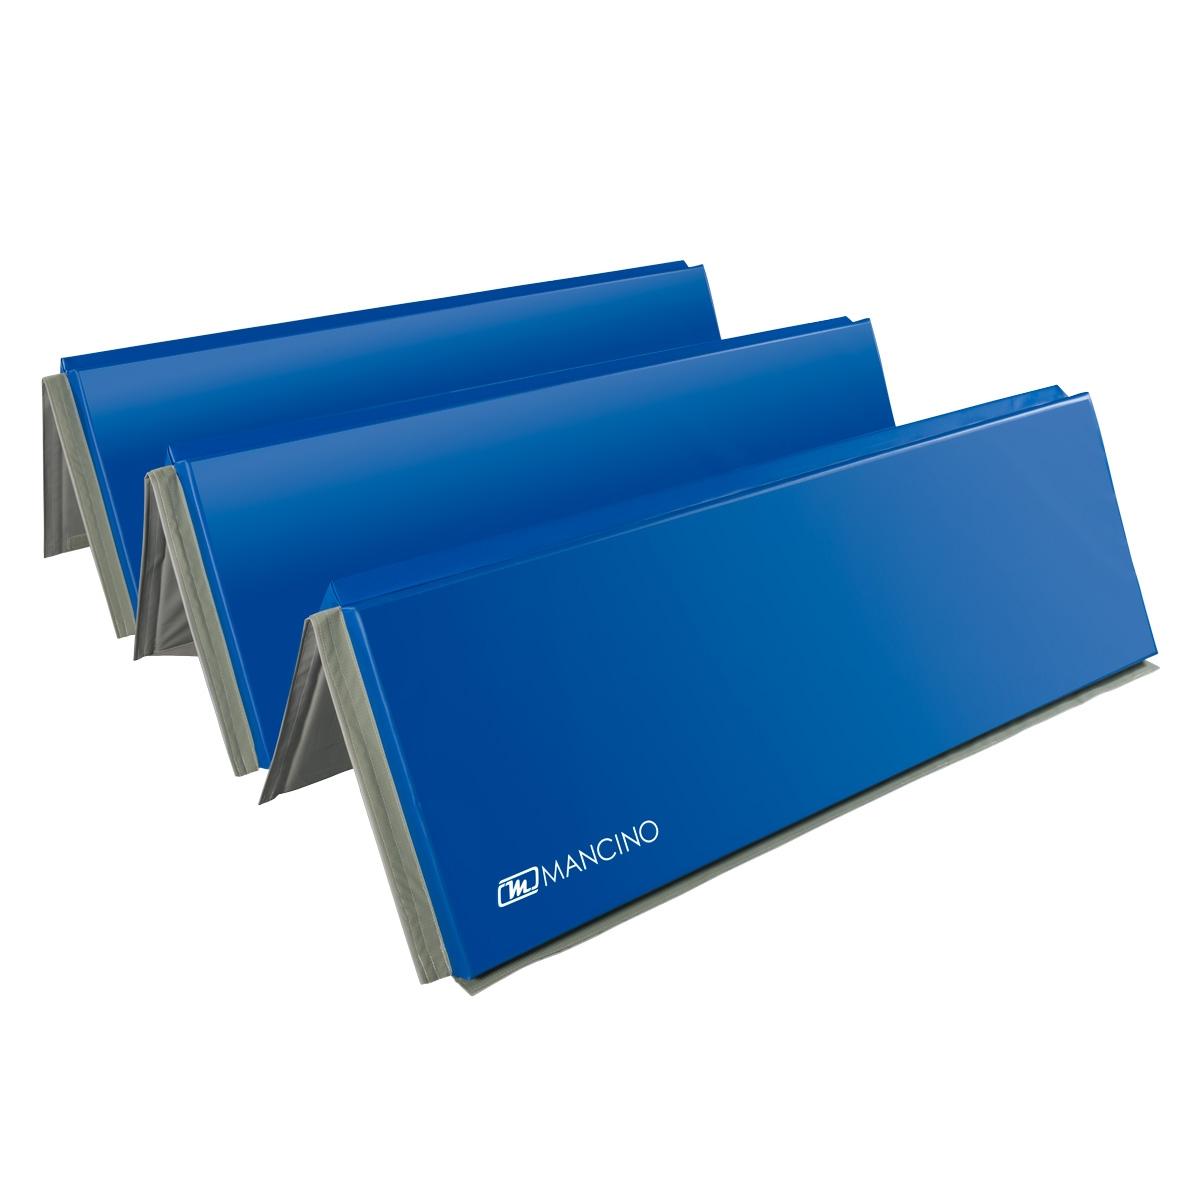 mma folding mat 6 x 12 panel mat in royal blue